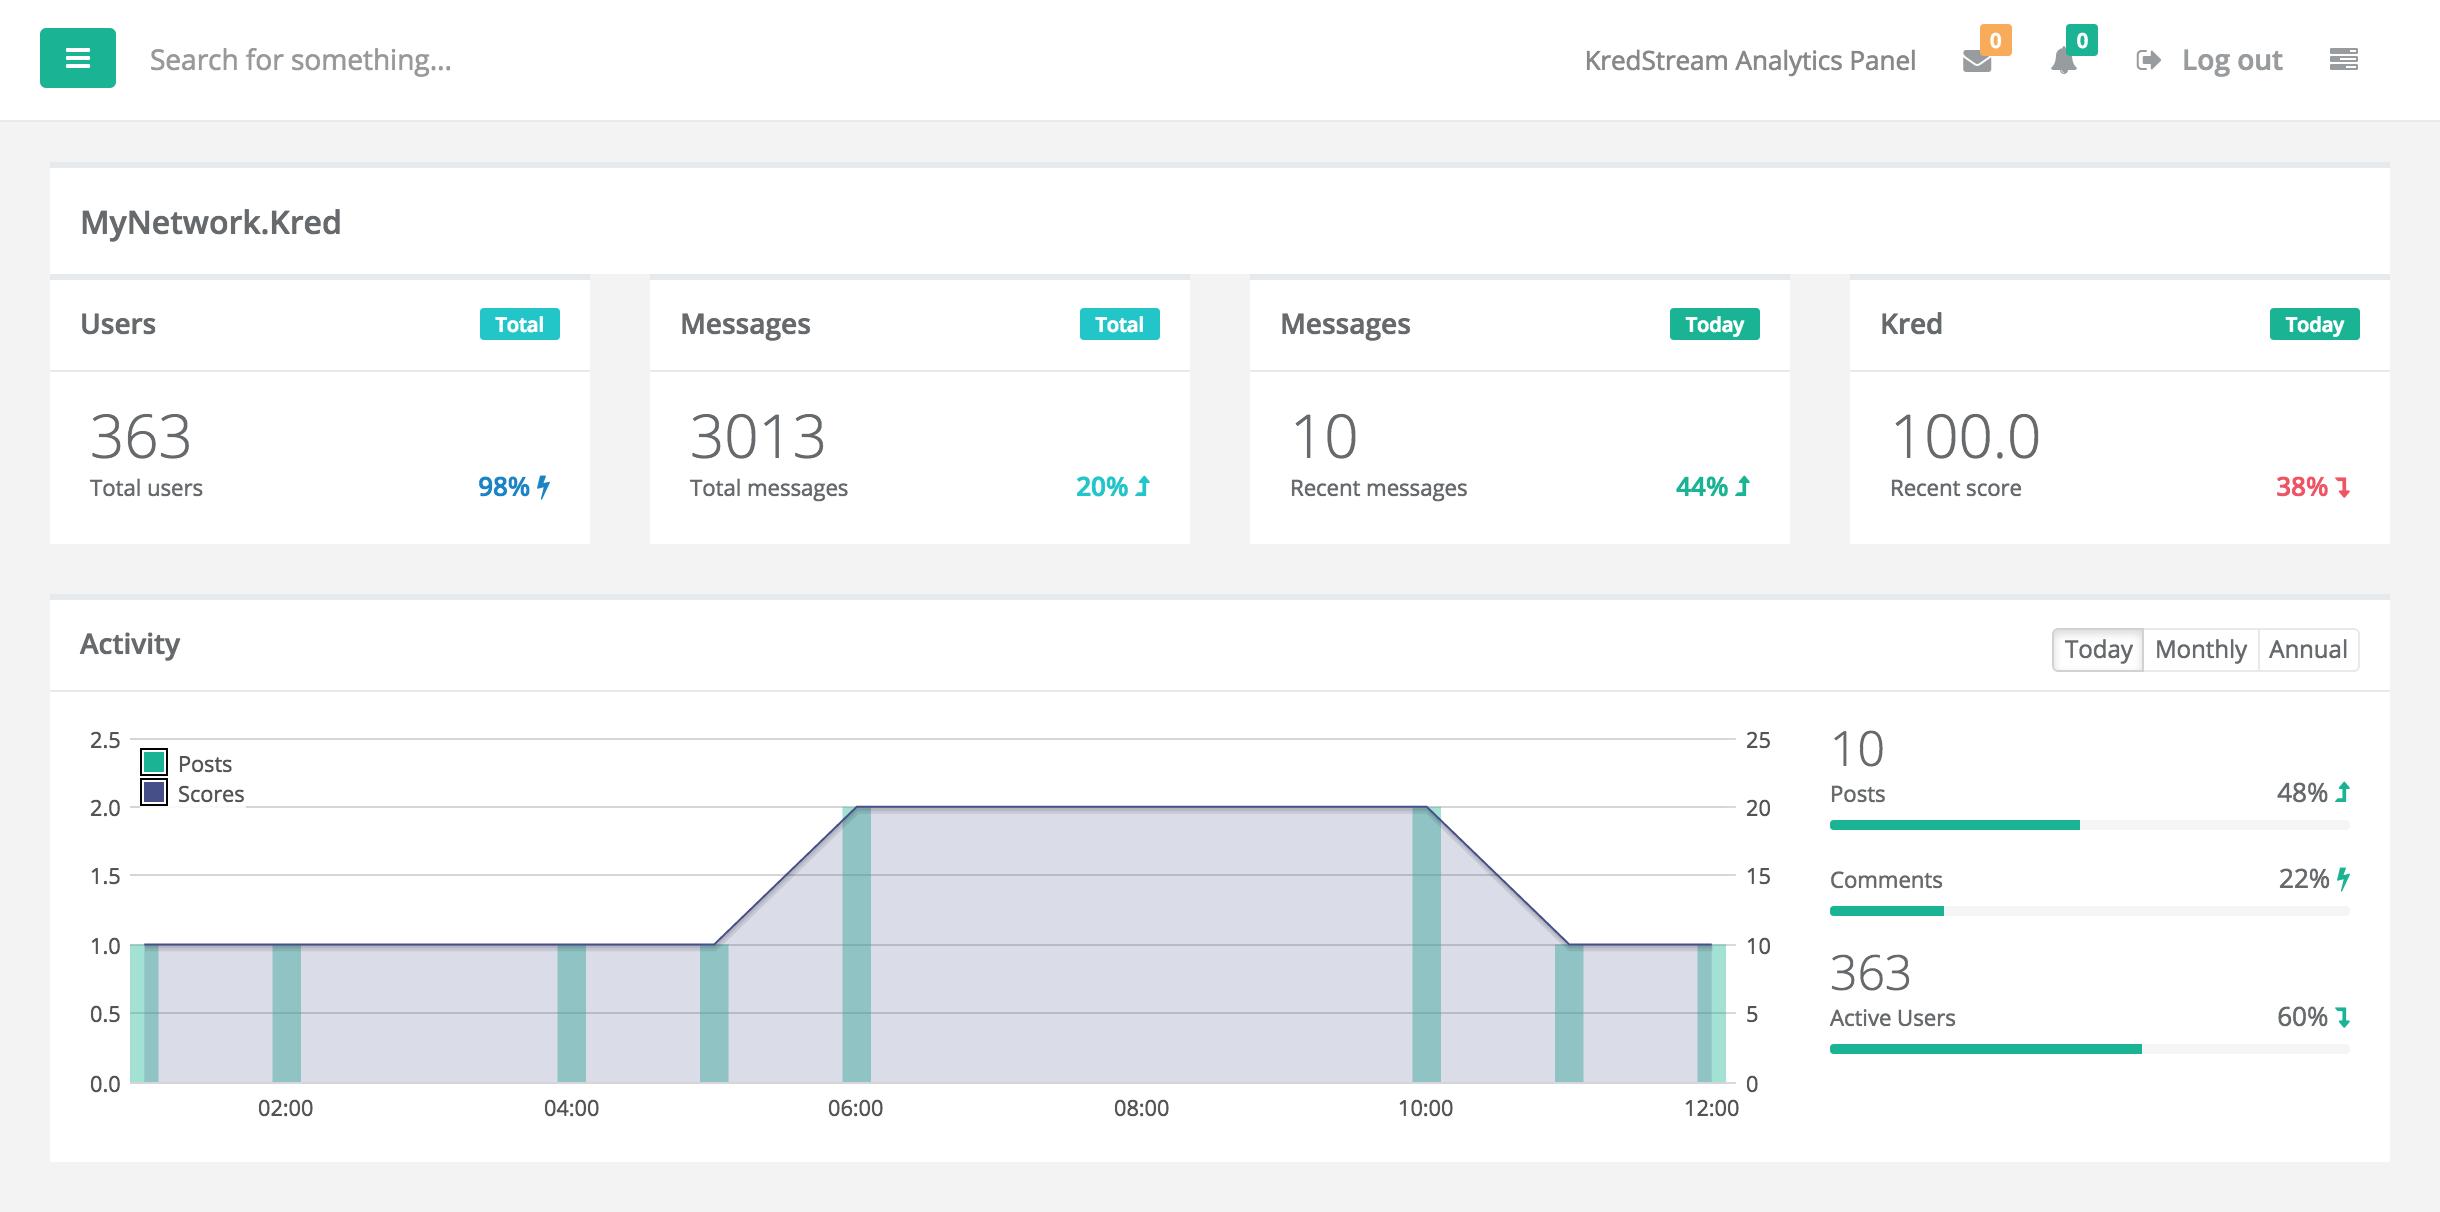 KredStream Analytics Panel